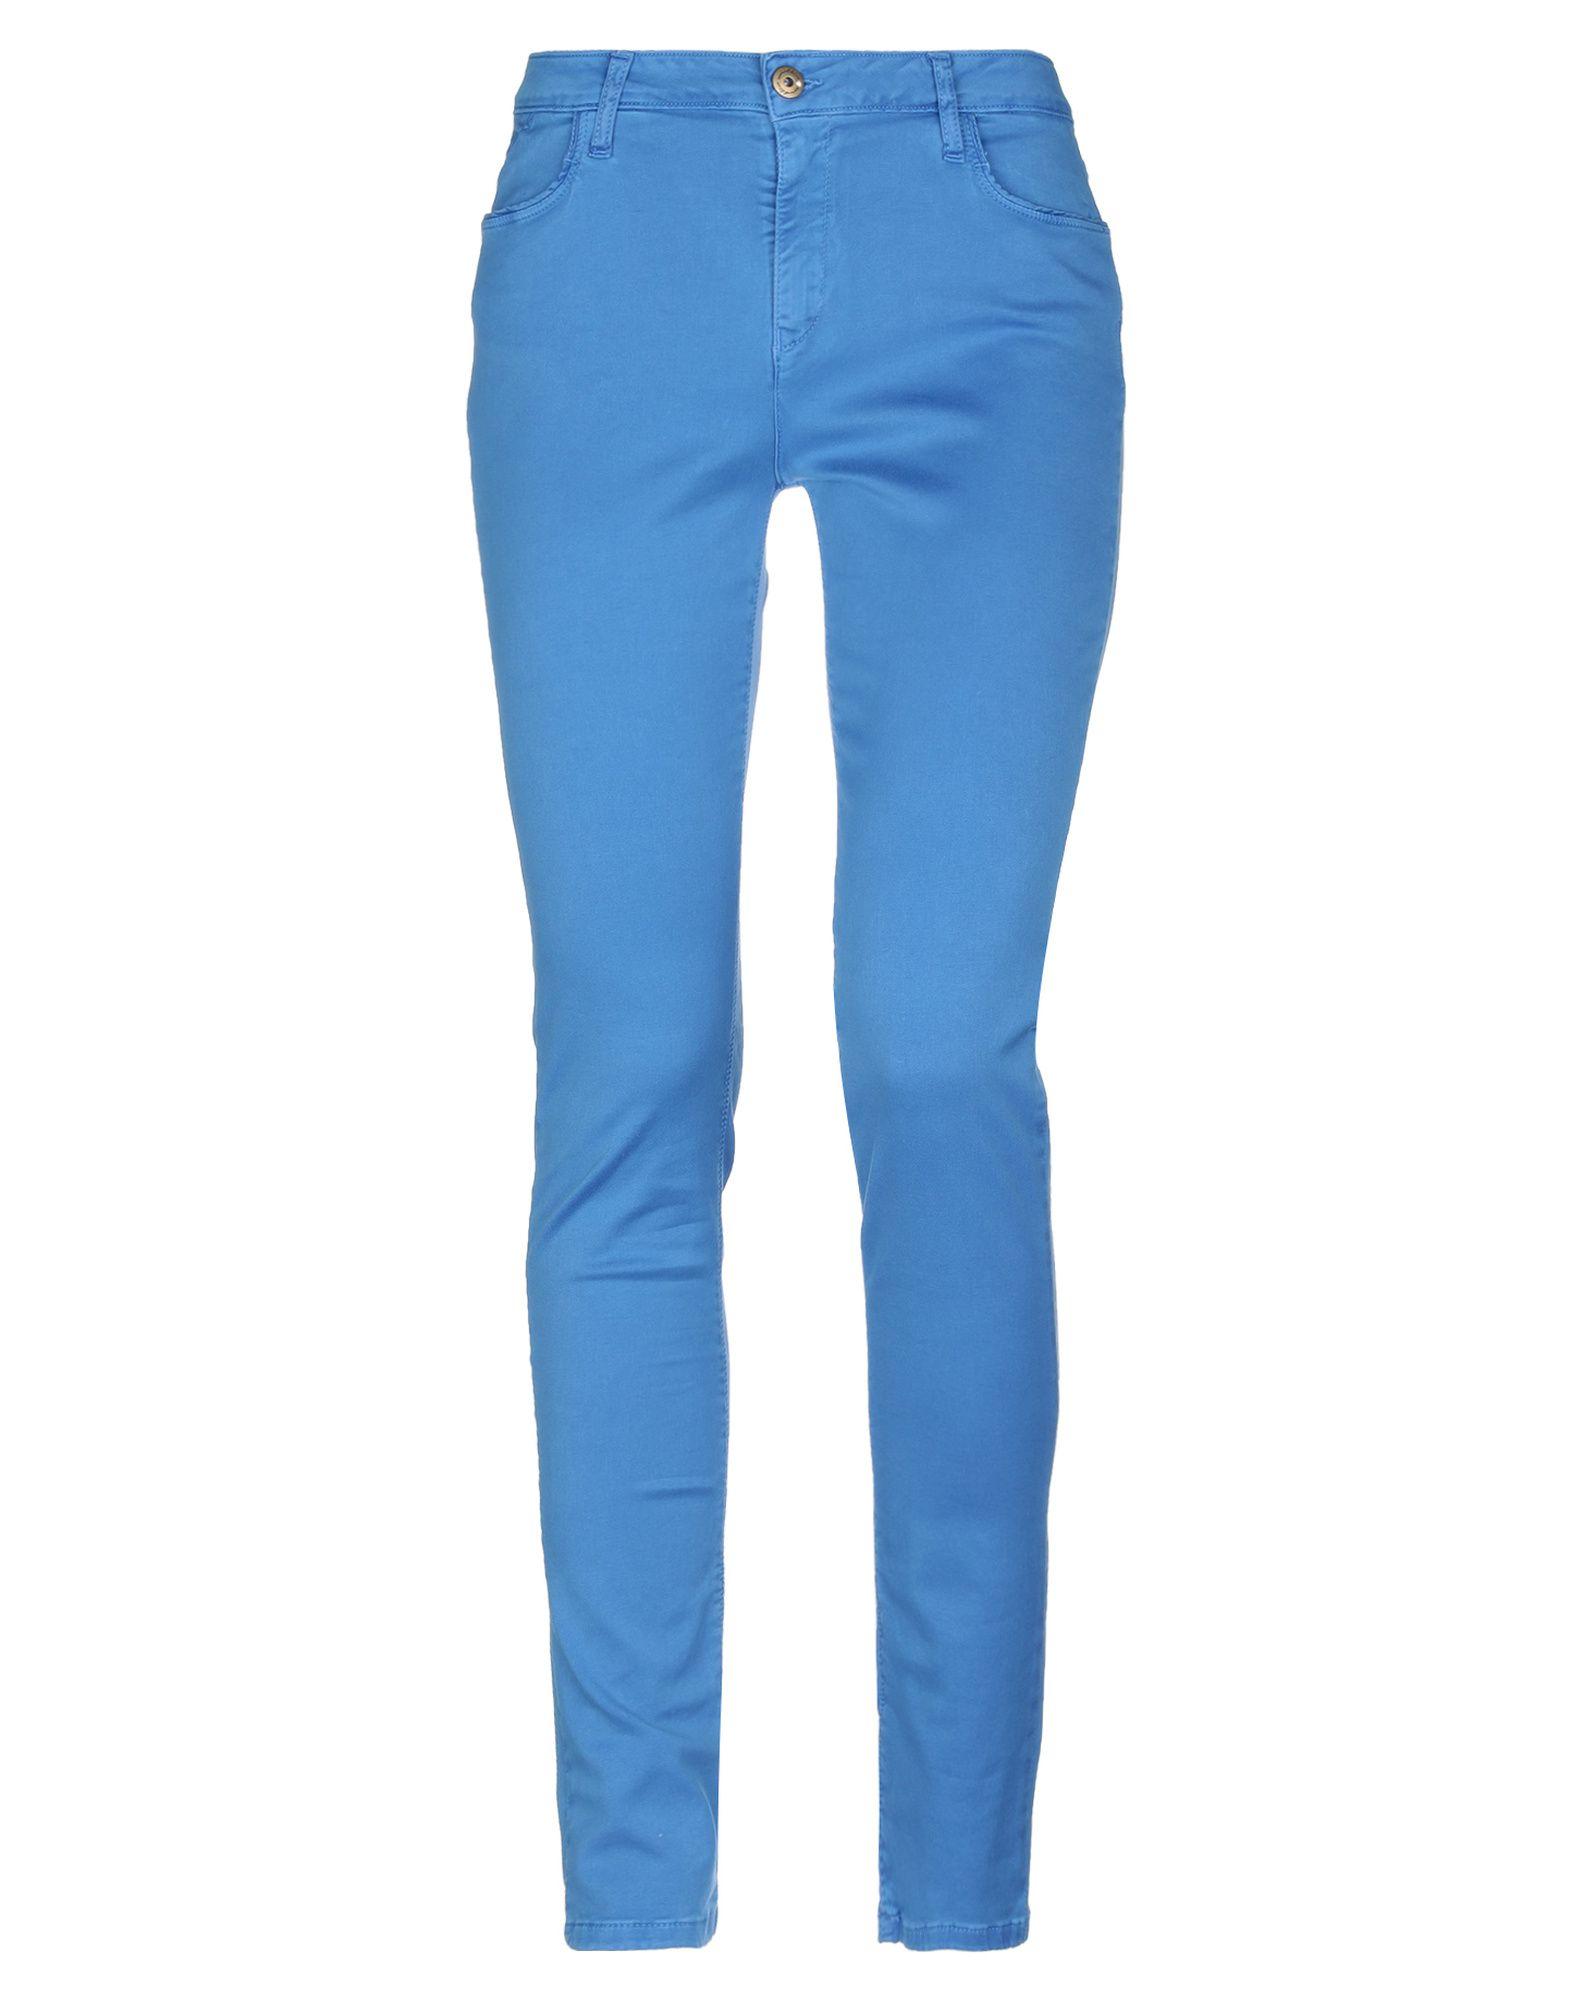 JUST BLUE by SOPHIE Джинсовые брюки цена 2017